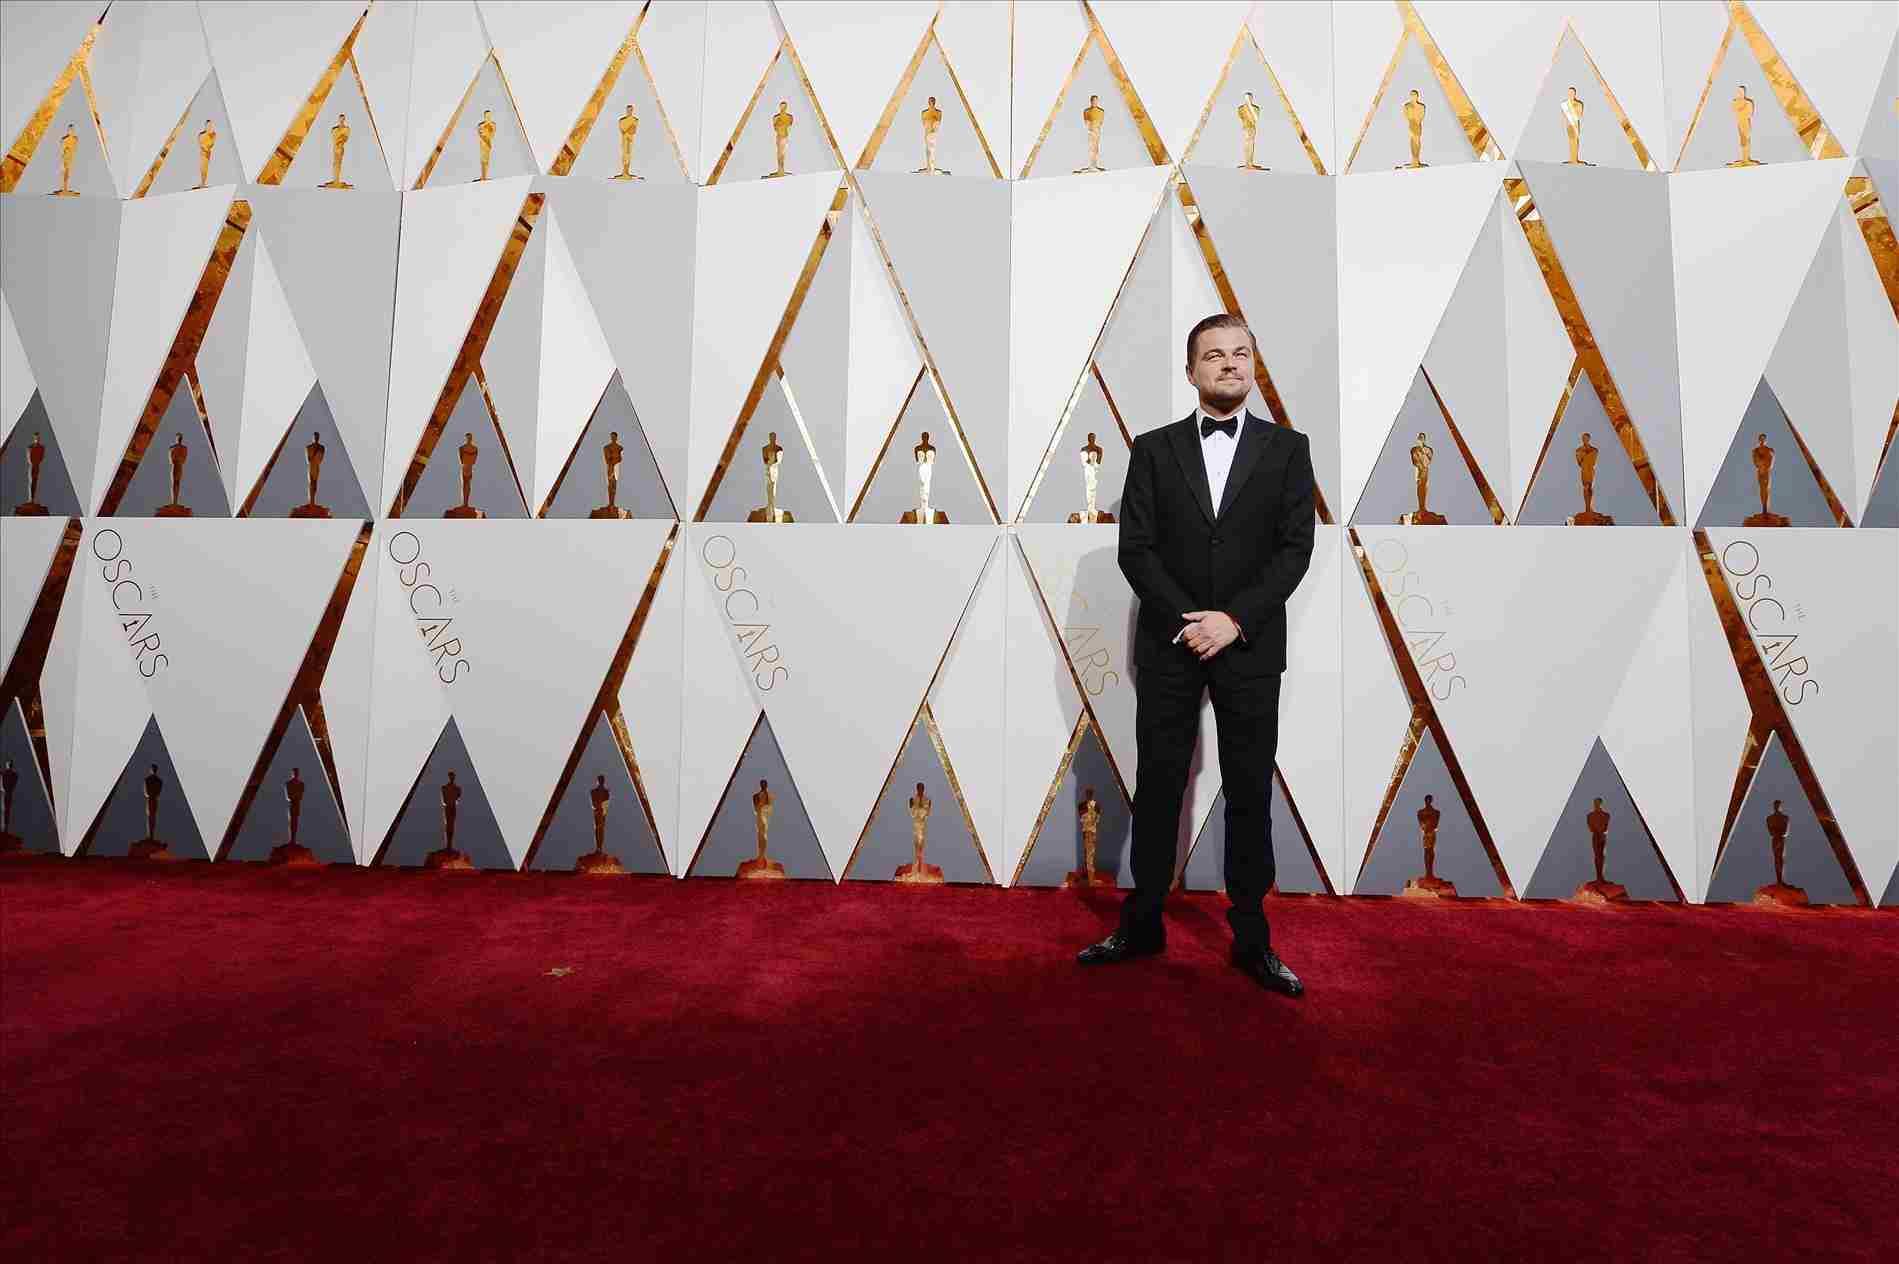 Red carpet backgrounds wallpaper cave - Oscar award wallpaper ...